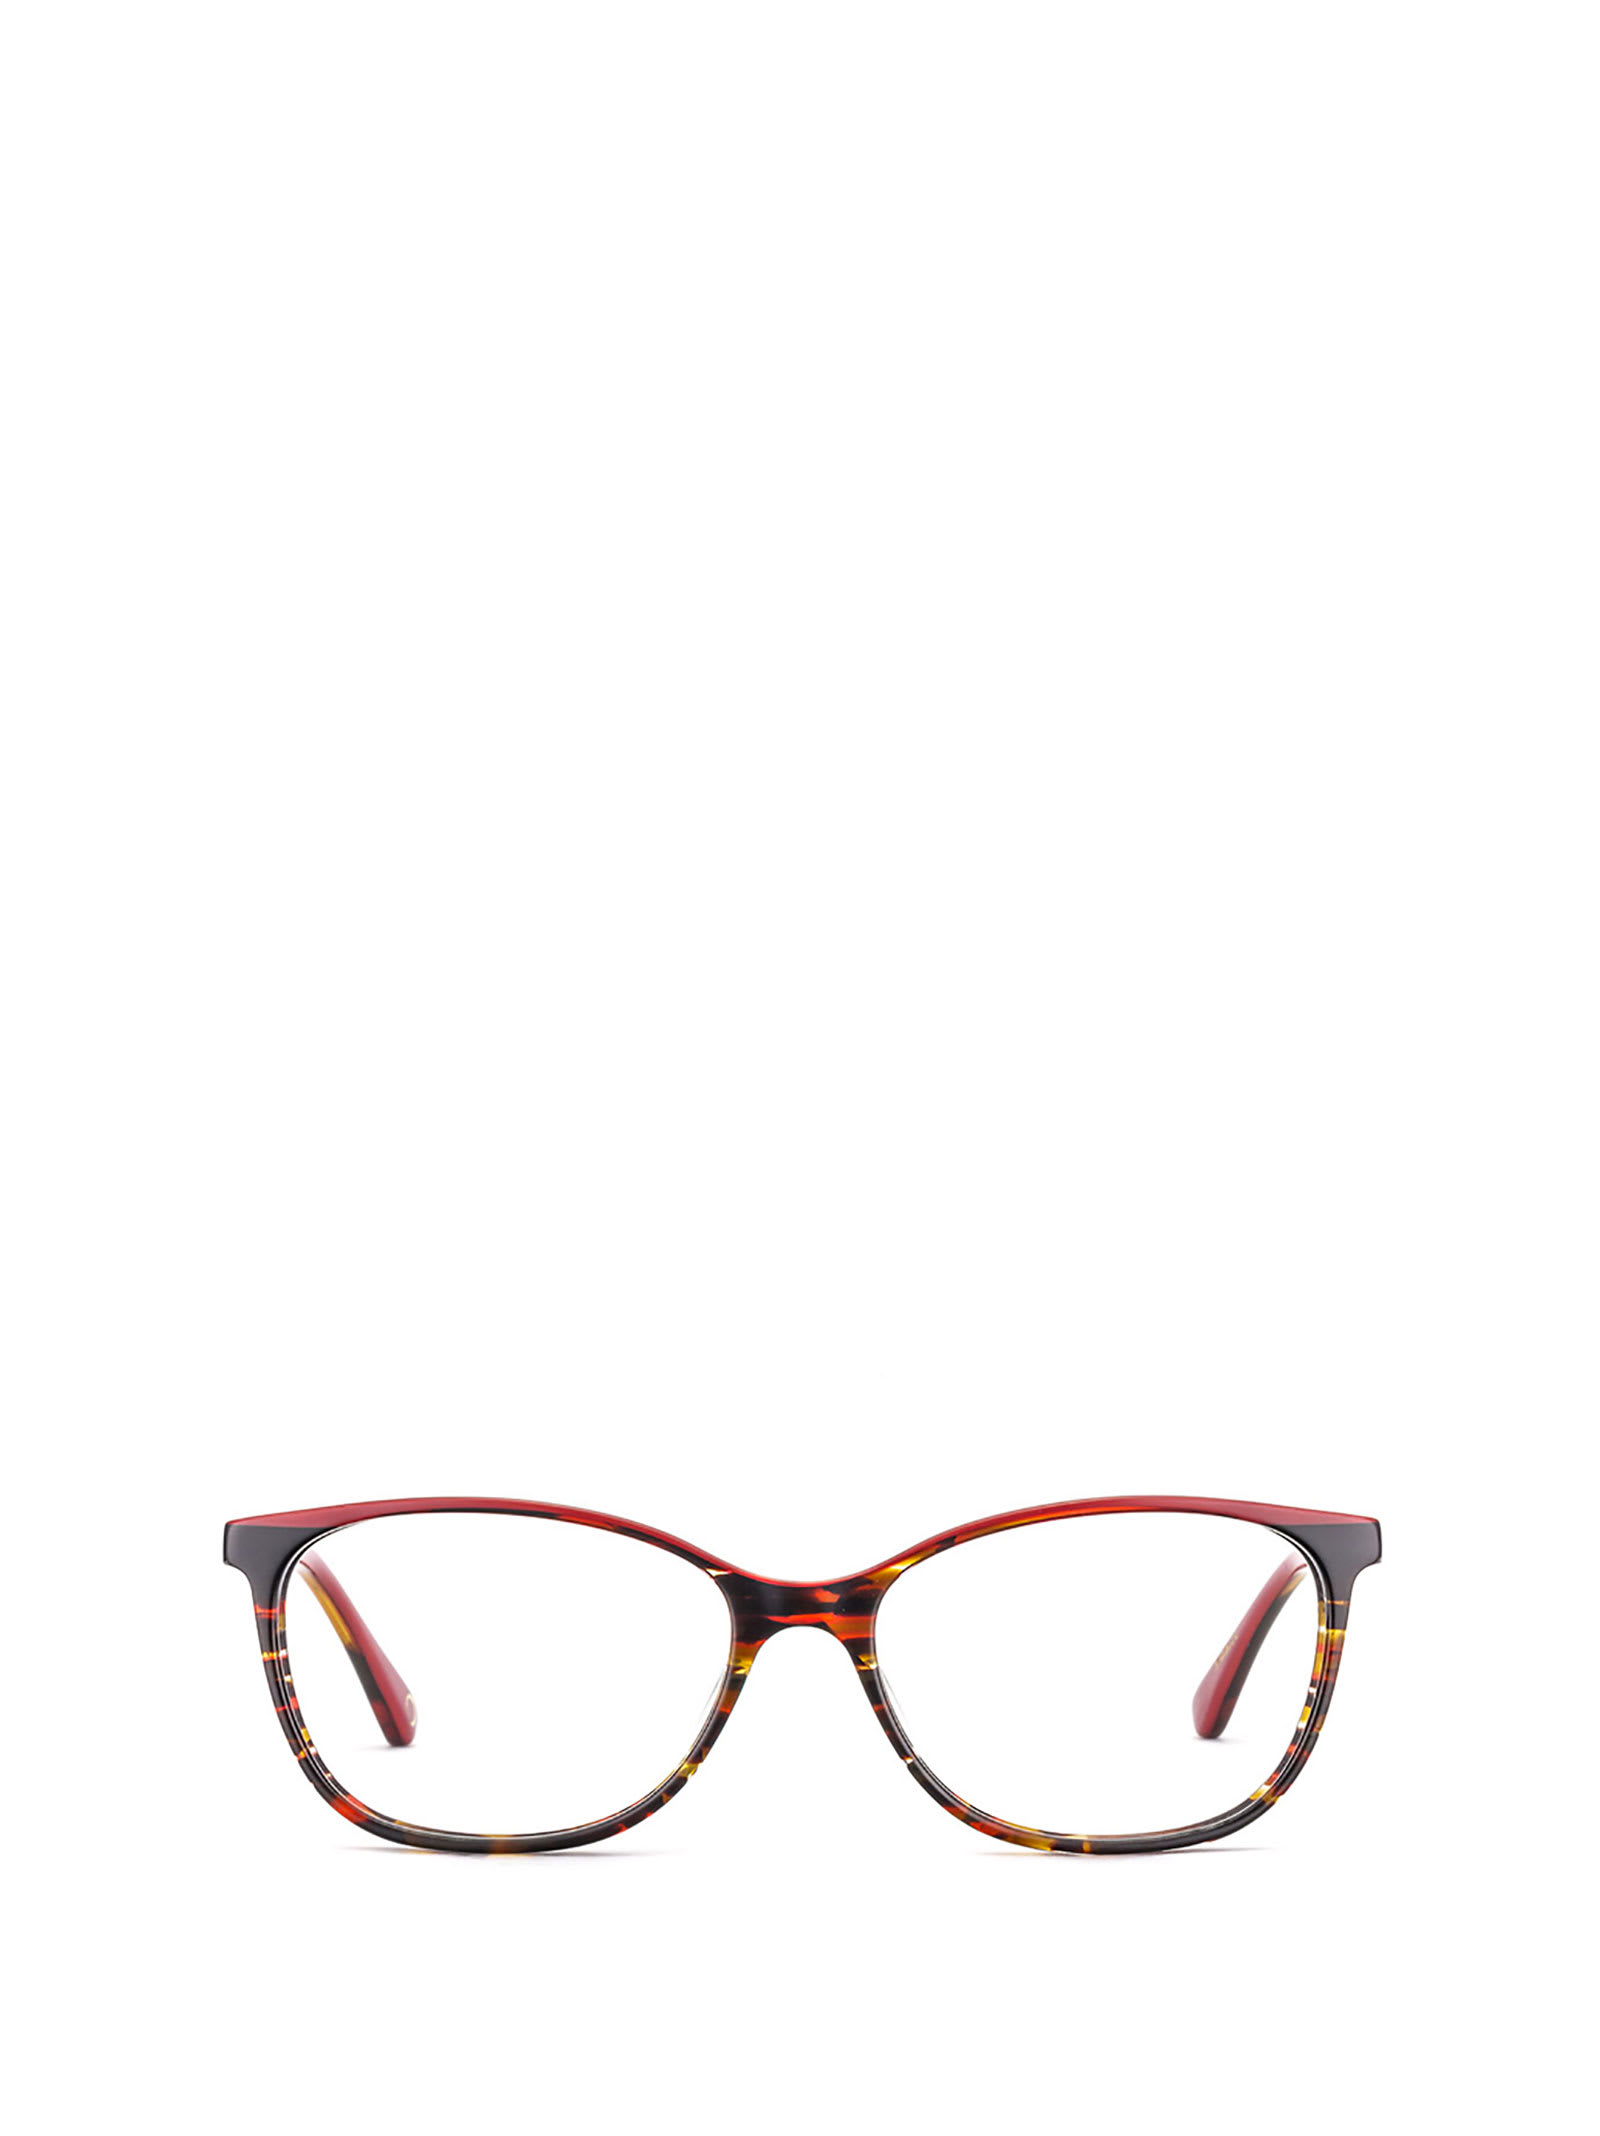 Etnia Barcelona Etnia Barcelona Dauphine Hvrd Glasses